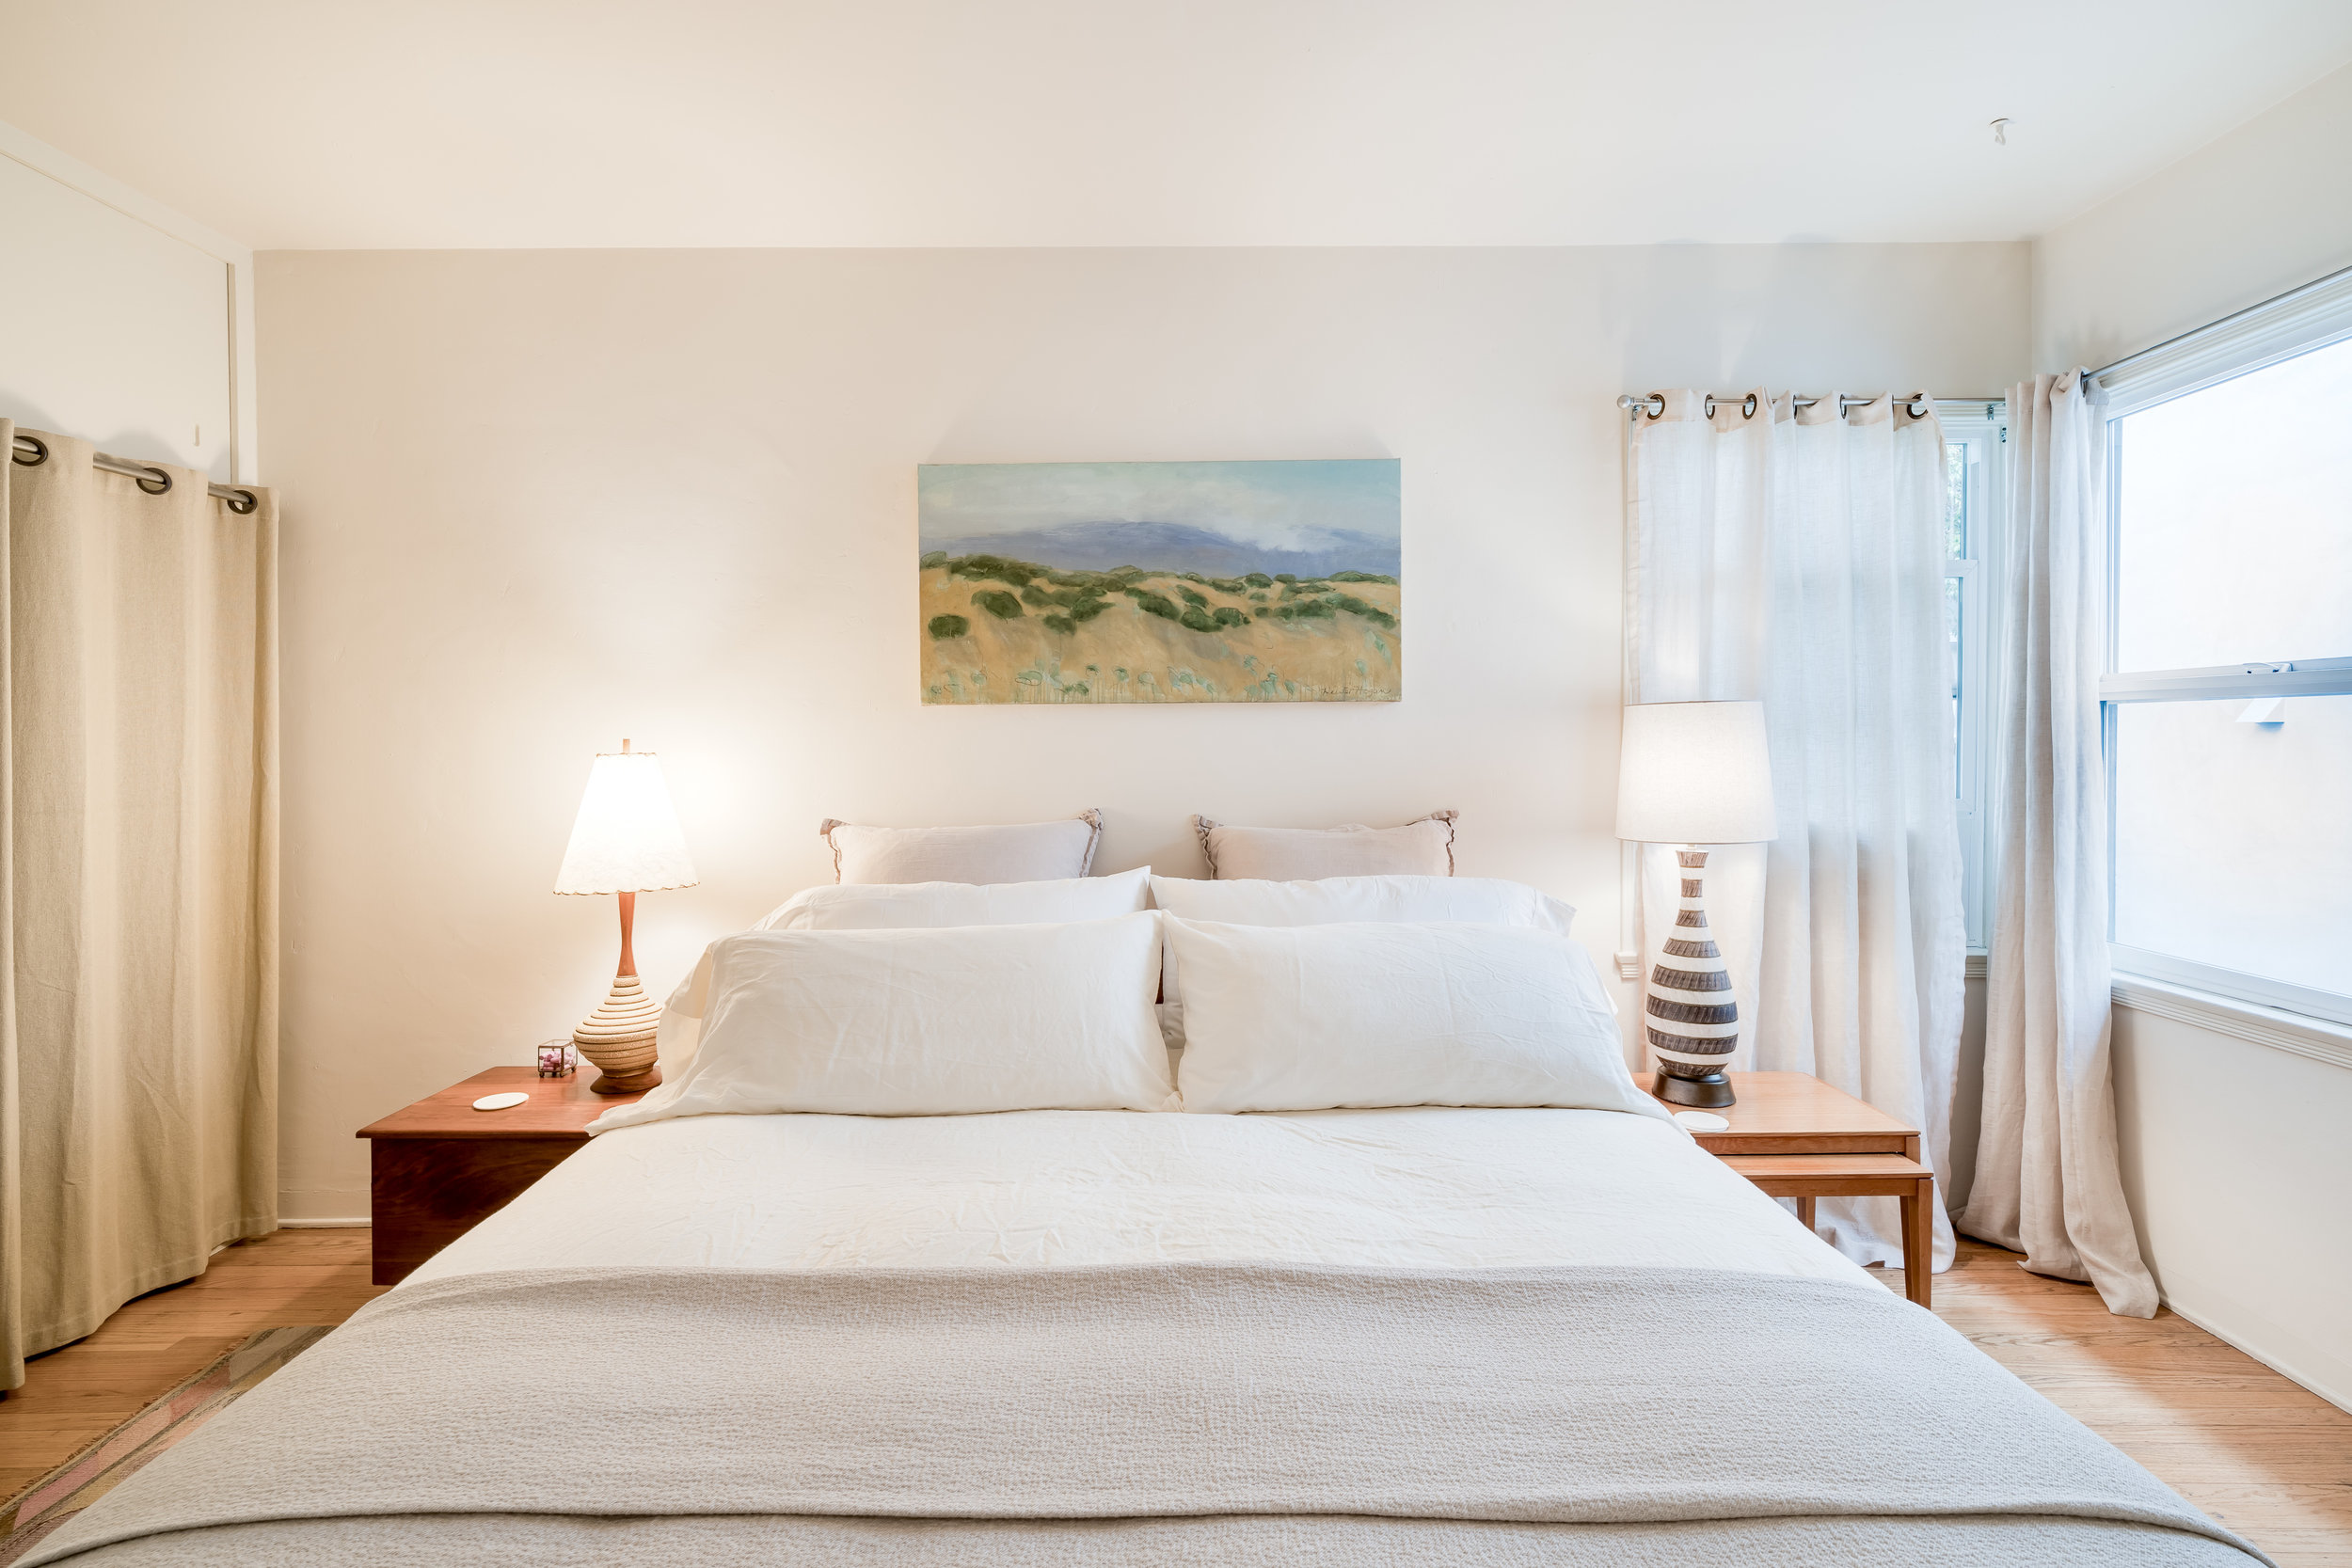 20181127_Airbnb02.jpg